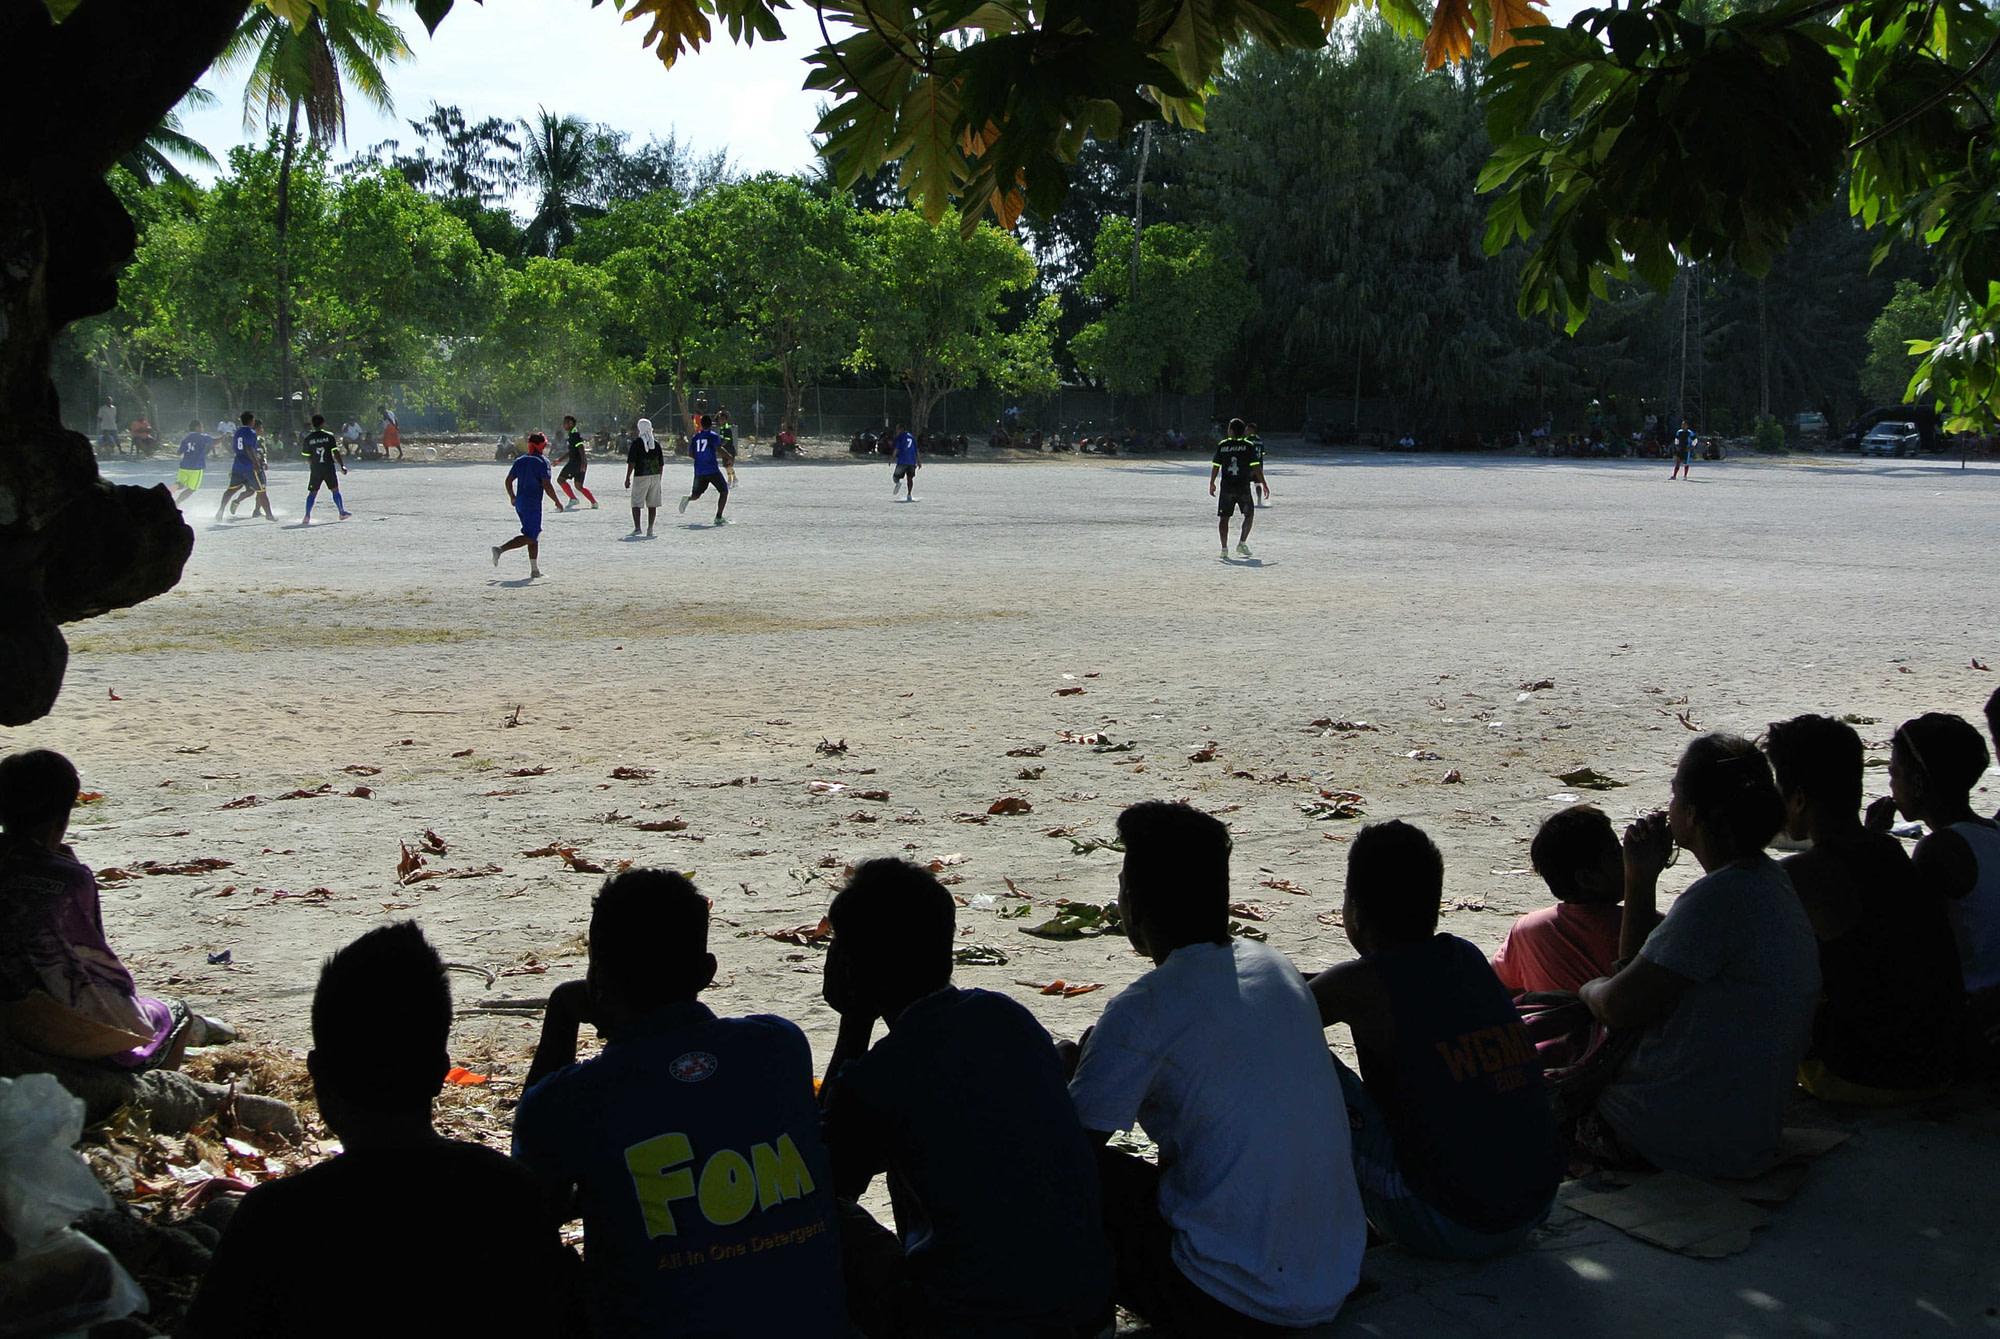 CONIFA travels to Kiribati to meet with Pacific member KIFA